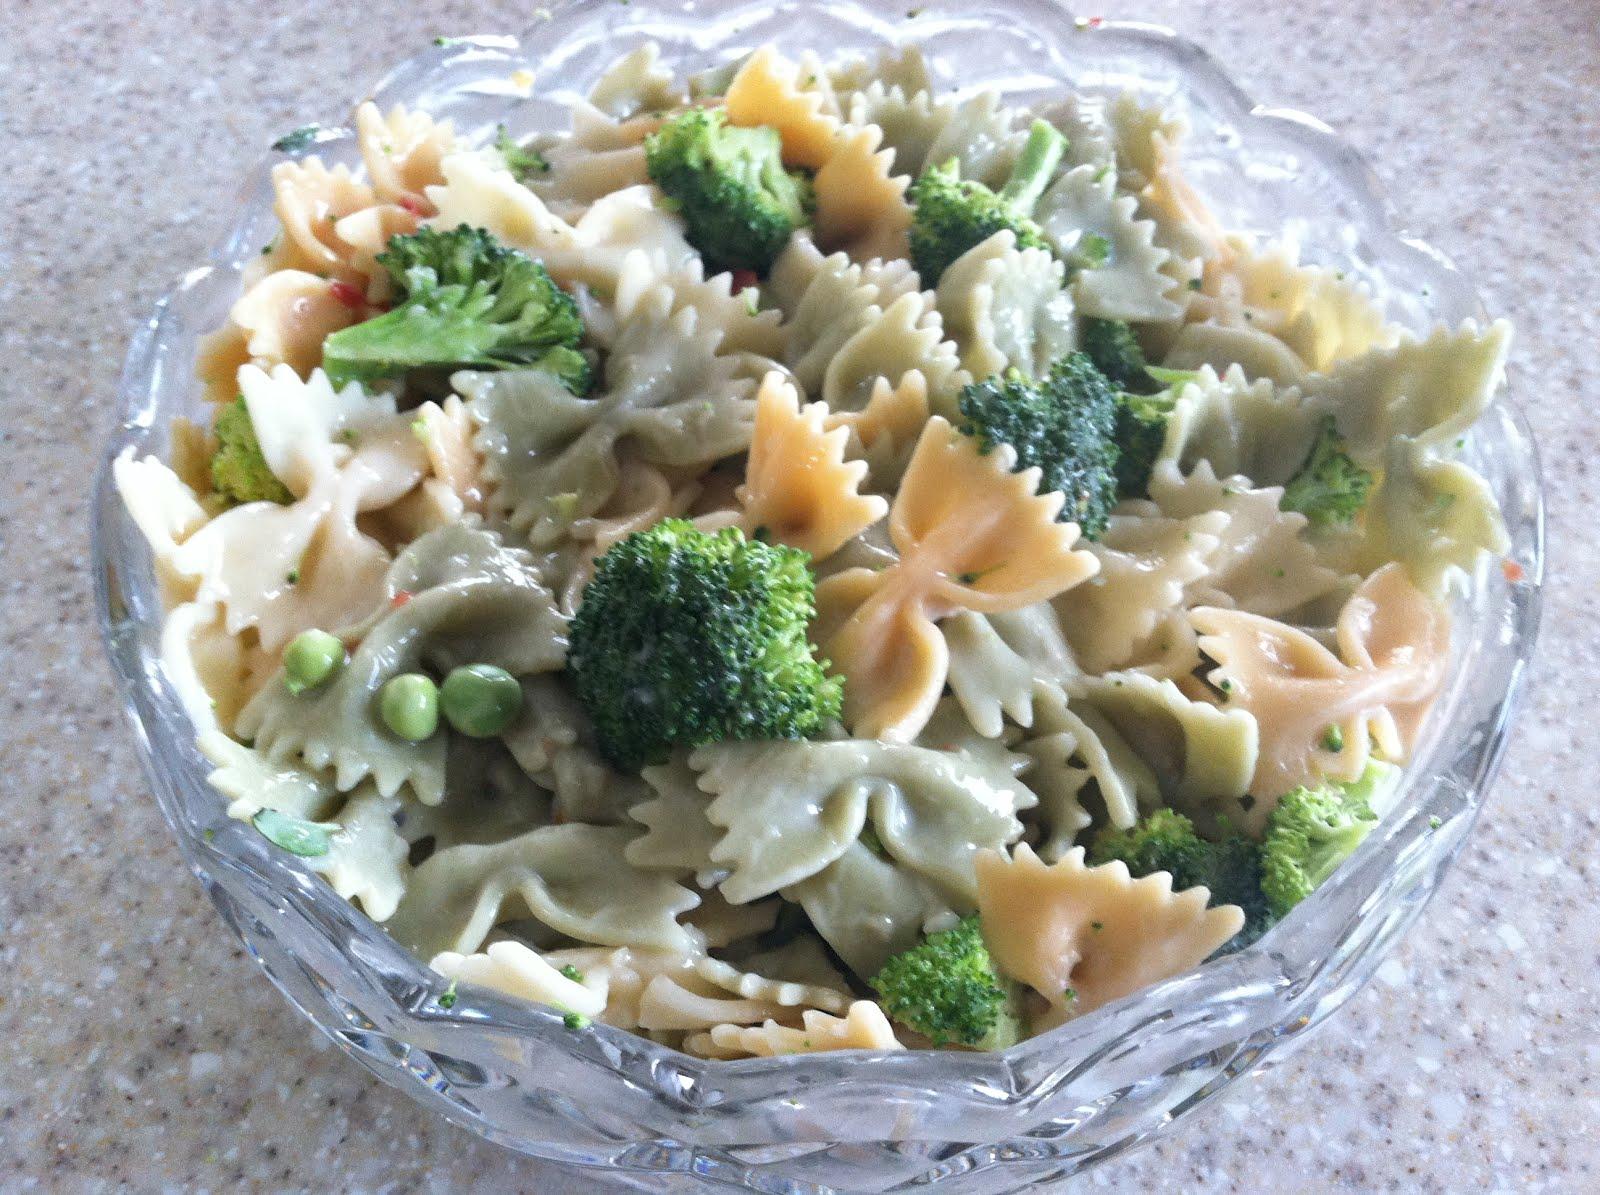 Produce Pantry: Garden Pasta Salad